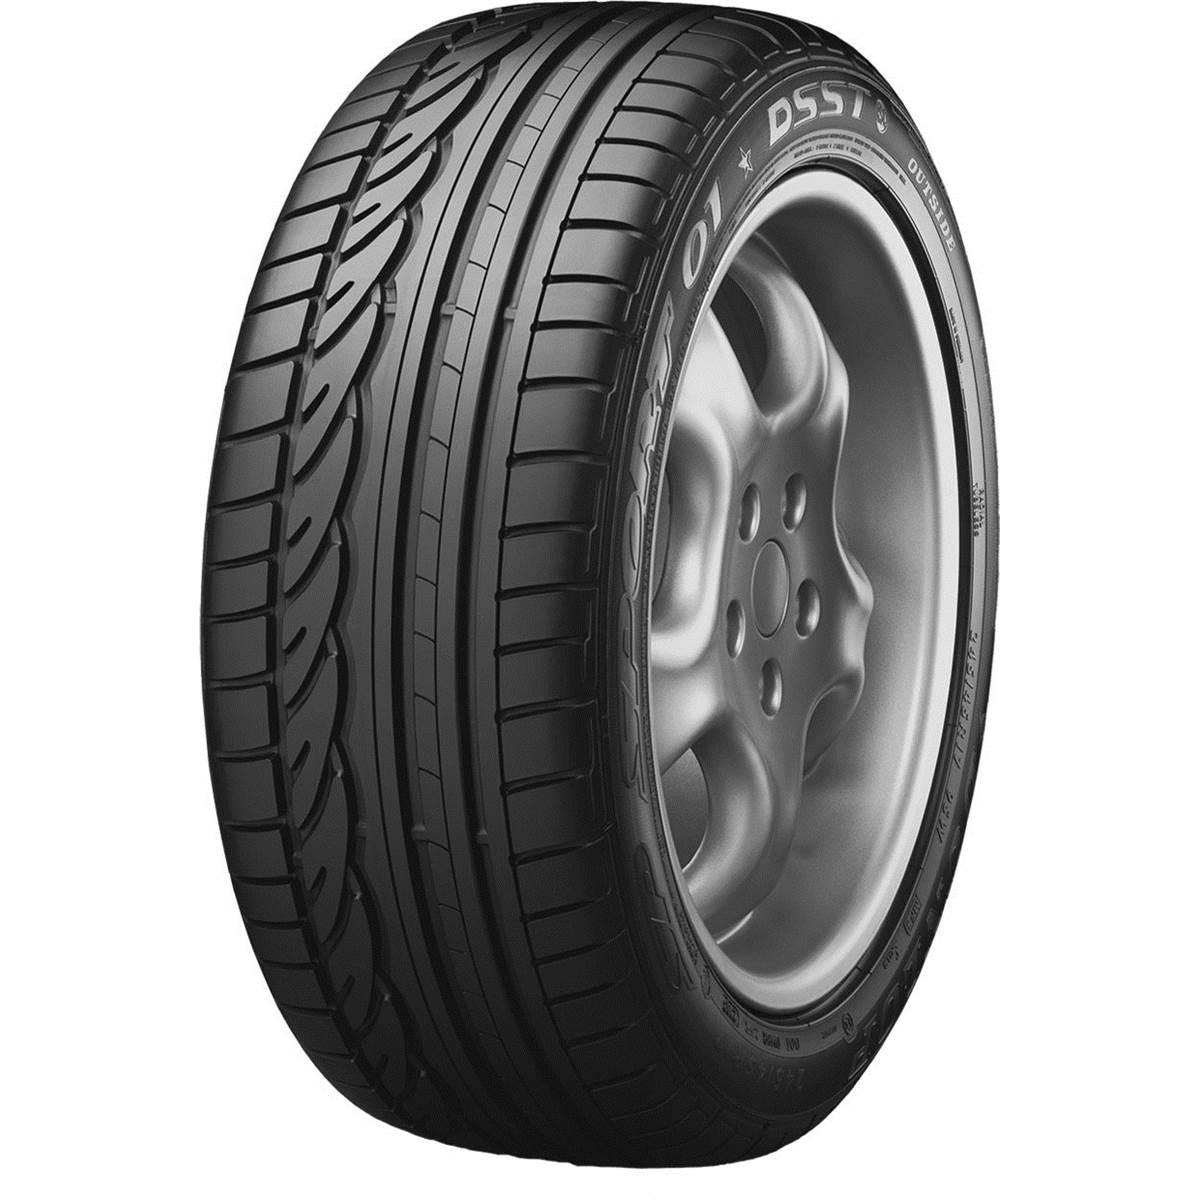 norauto pneus 4 saisons pneu 4 saisons uniroyal 185 65r15 88t allseasonexpert feu vert pneu. Black Bedroom Furniture Sets. Home Design Ideas